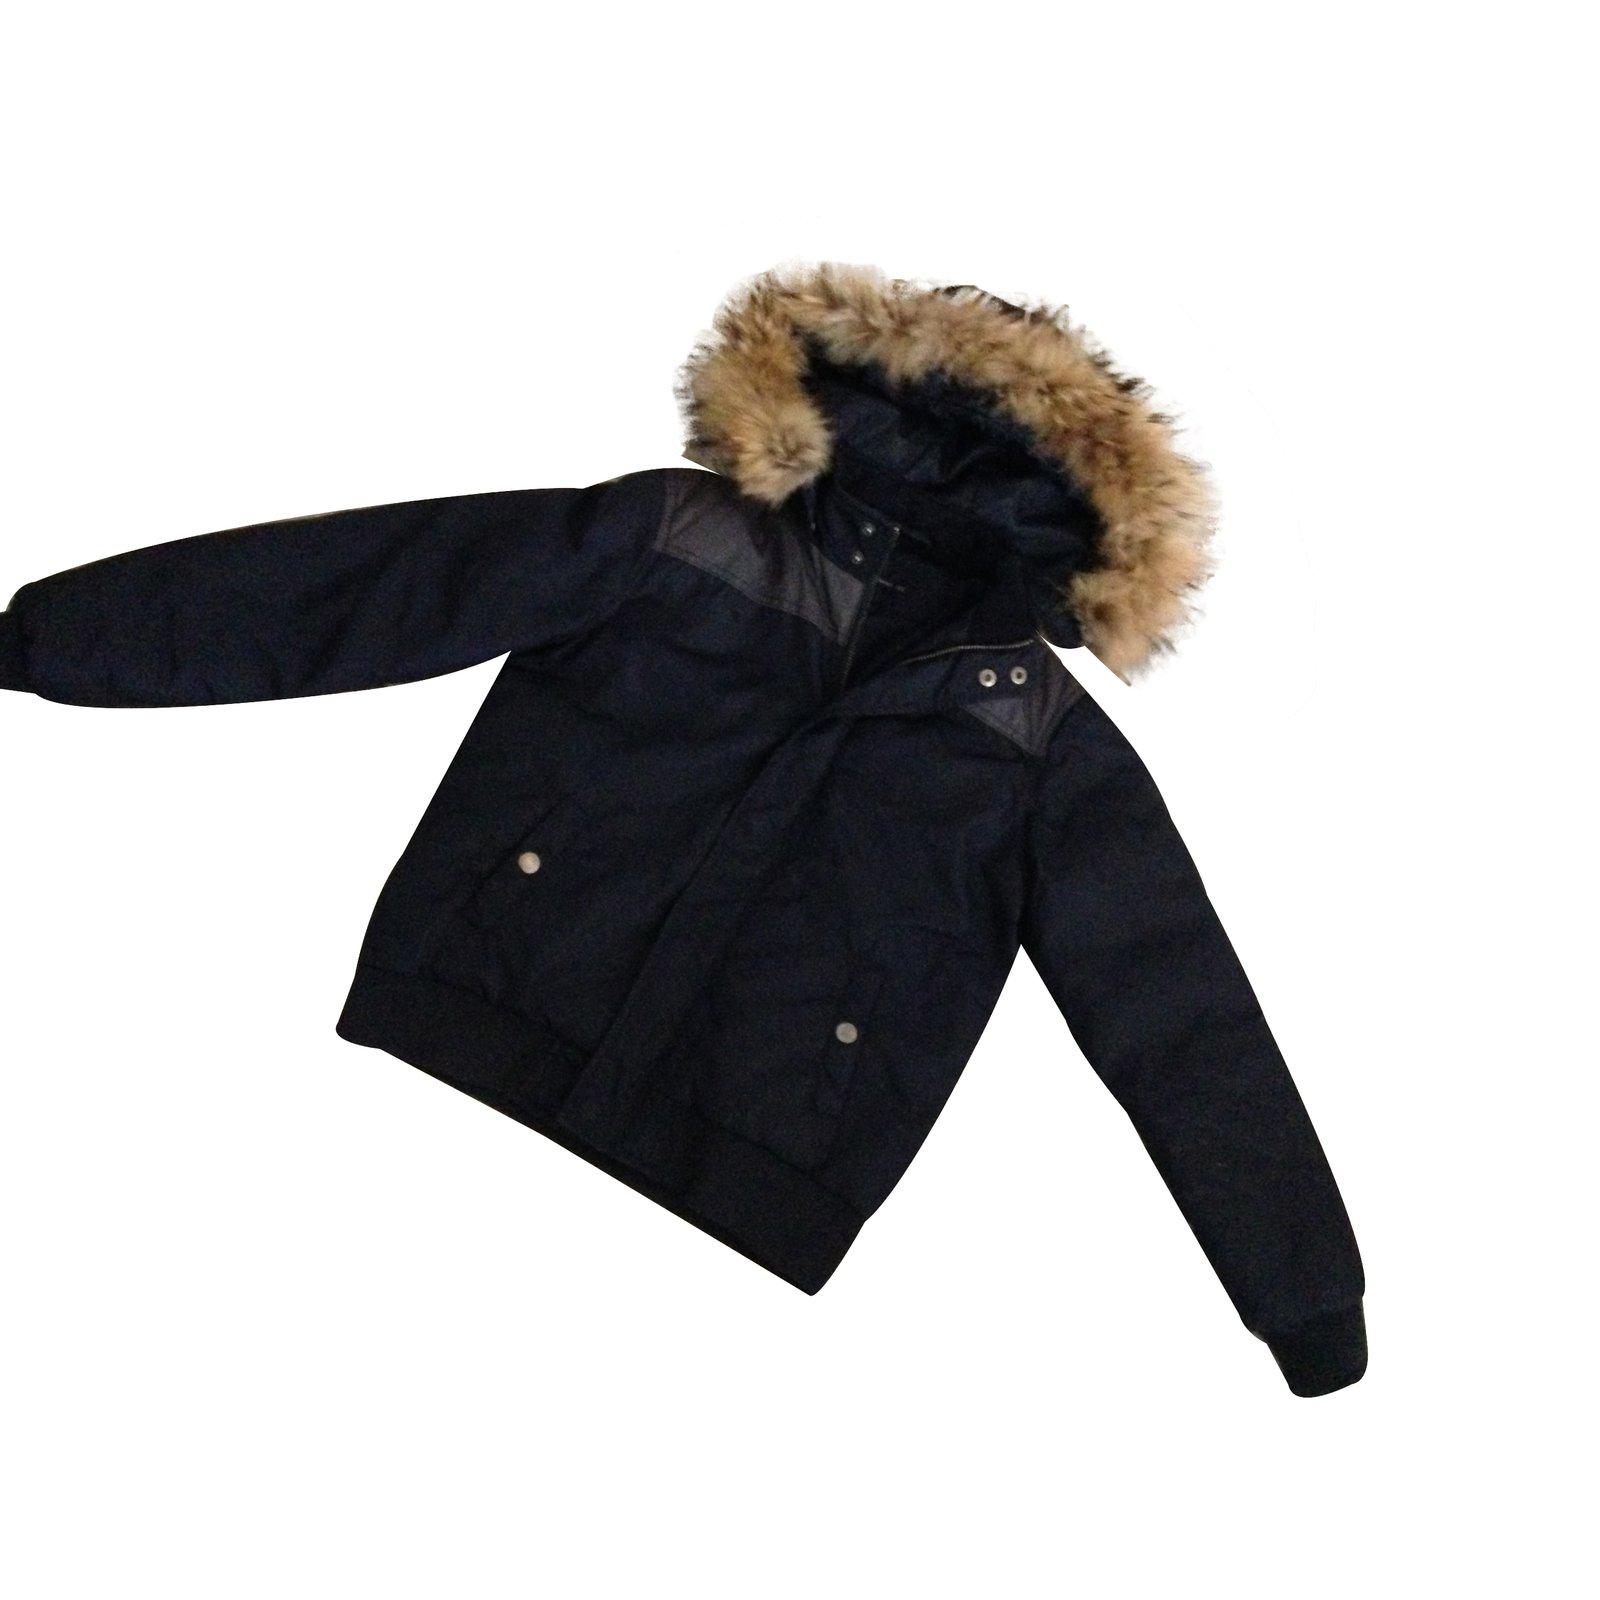 blousons manteaux gar on teddy smith manteau gar on. Black Bedroom Furniture Sets. Home Design Ideas